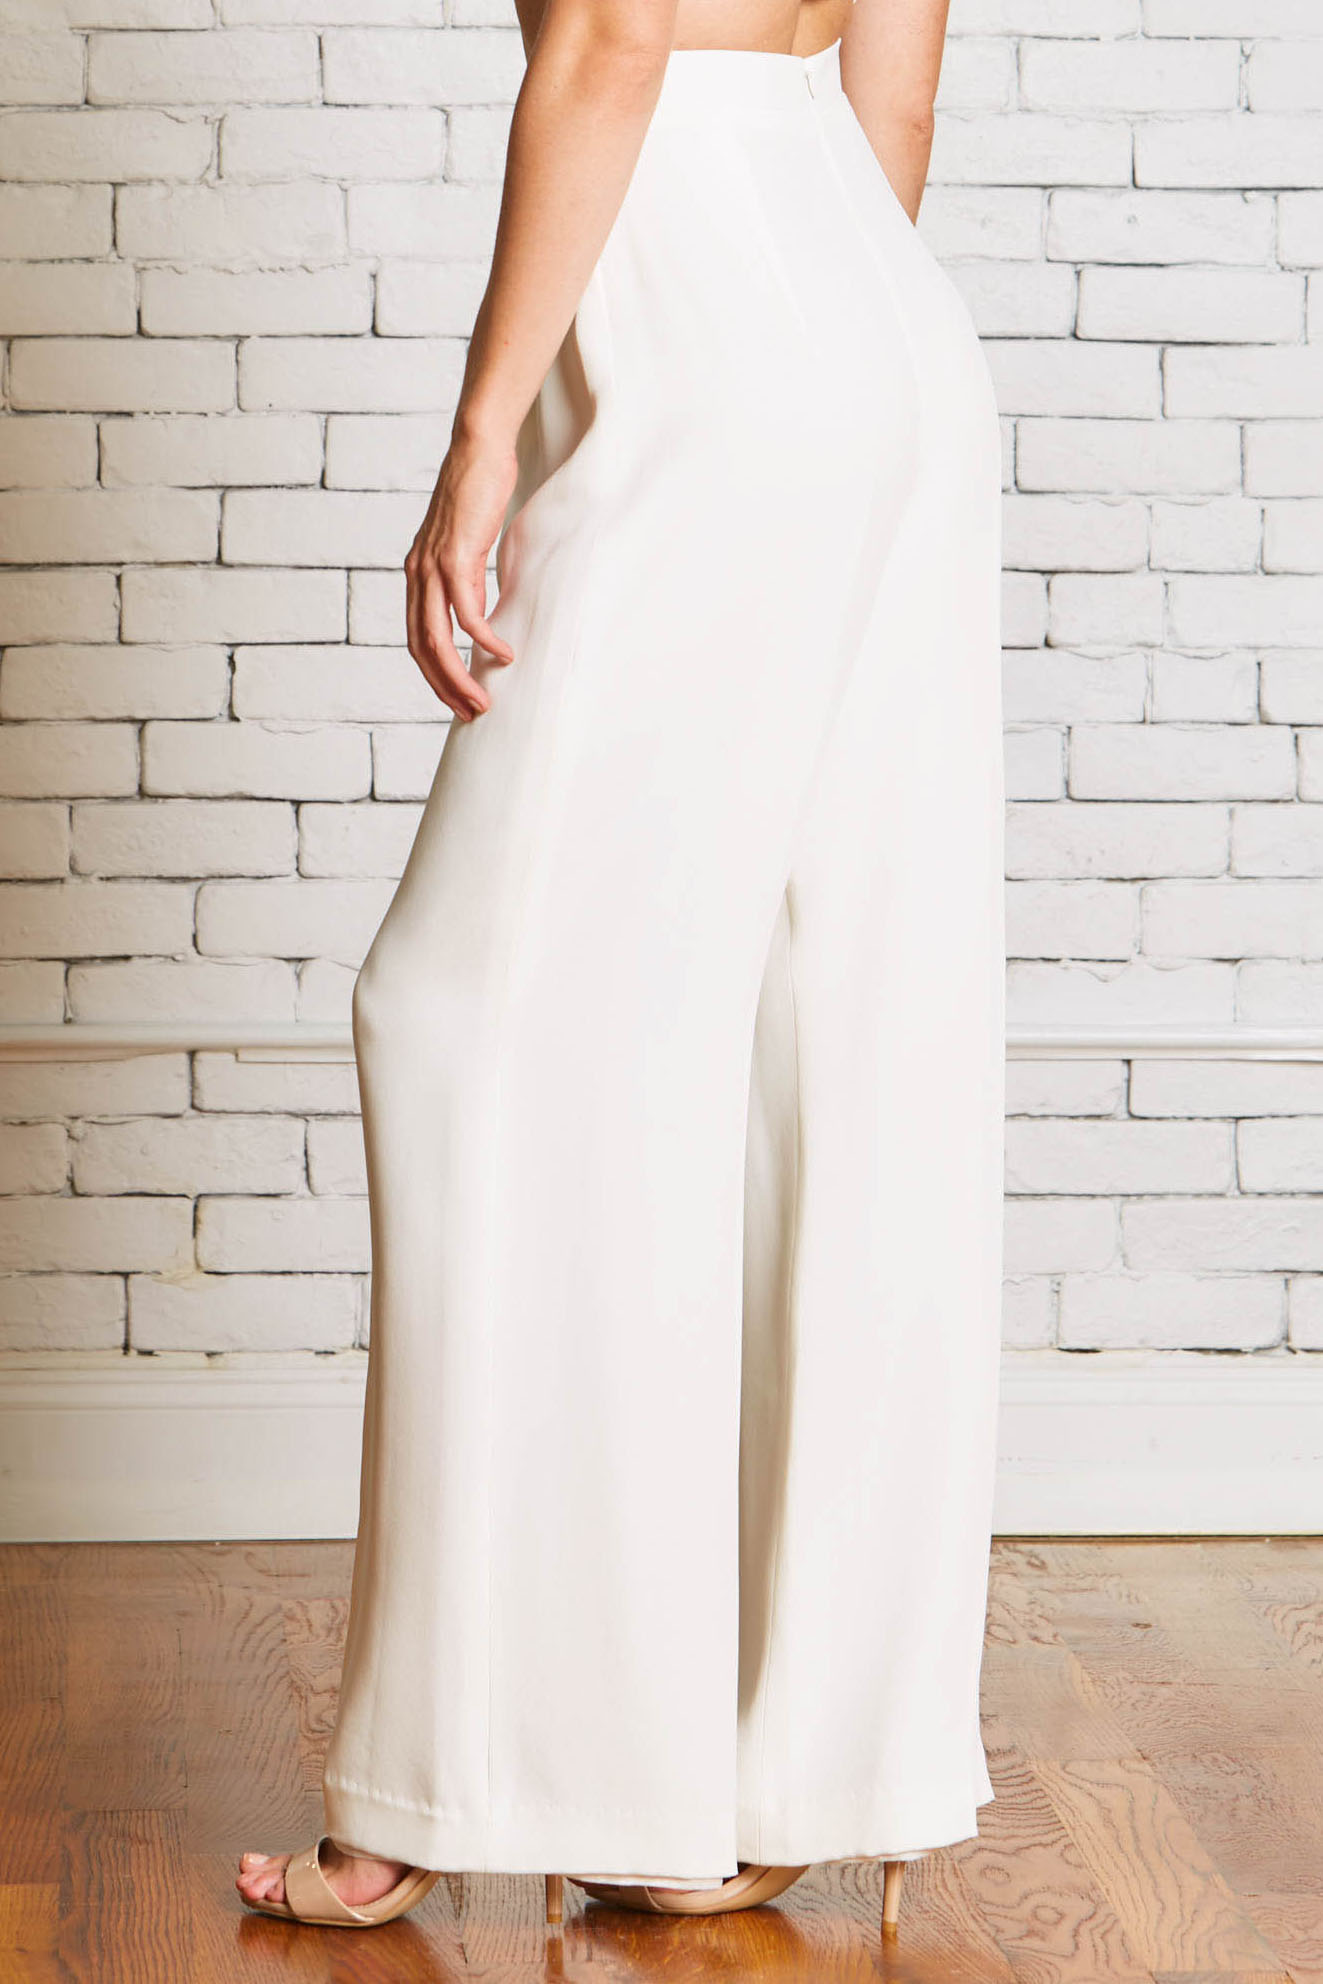 27b.Rebecca_Schoneveld_Camden_Trouser_back-Wedding_Pants_Wide_Leg_Separates_Modern_Bride.jpg